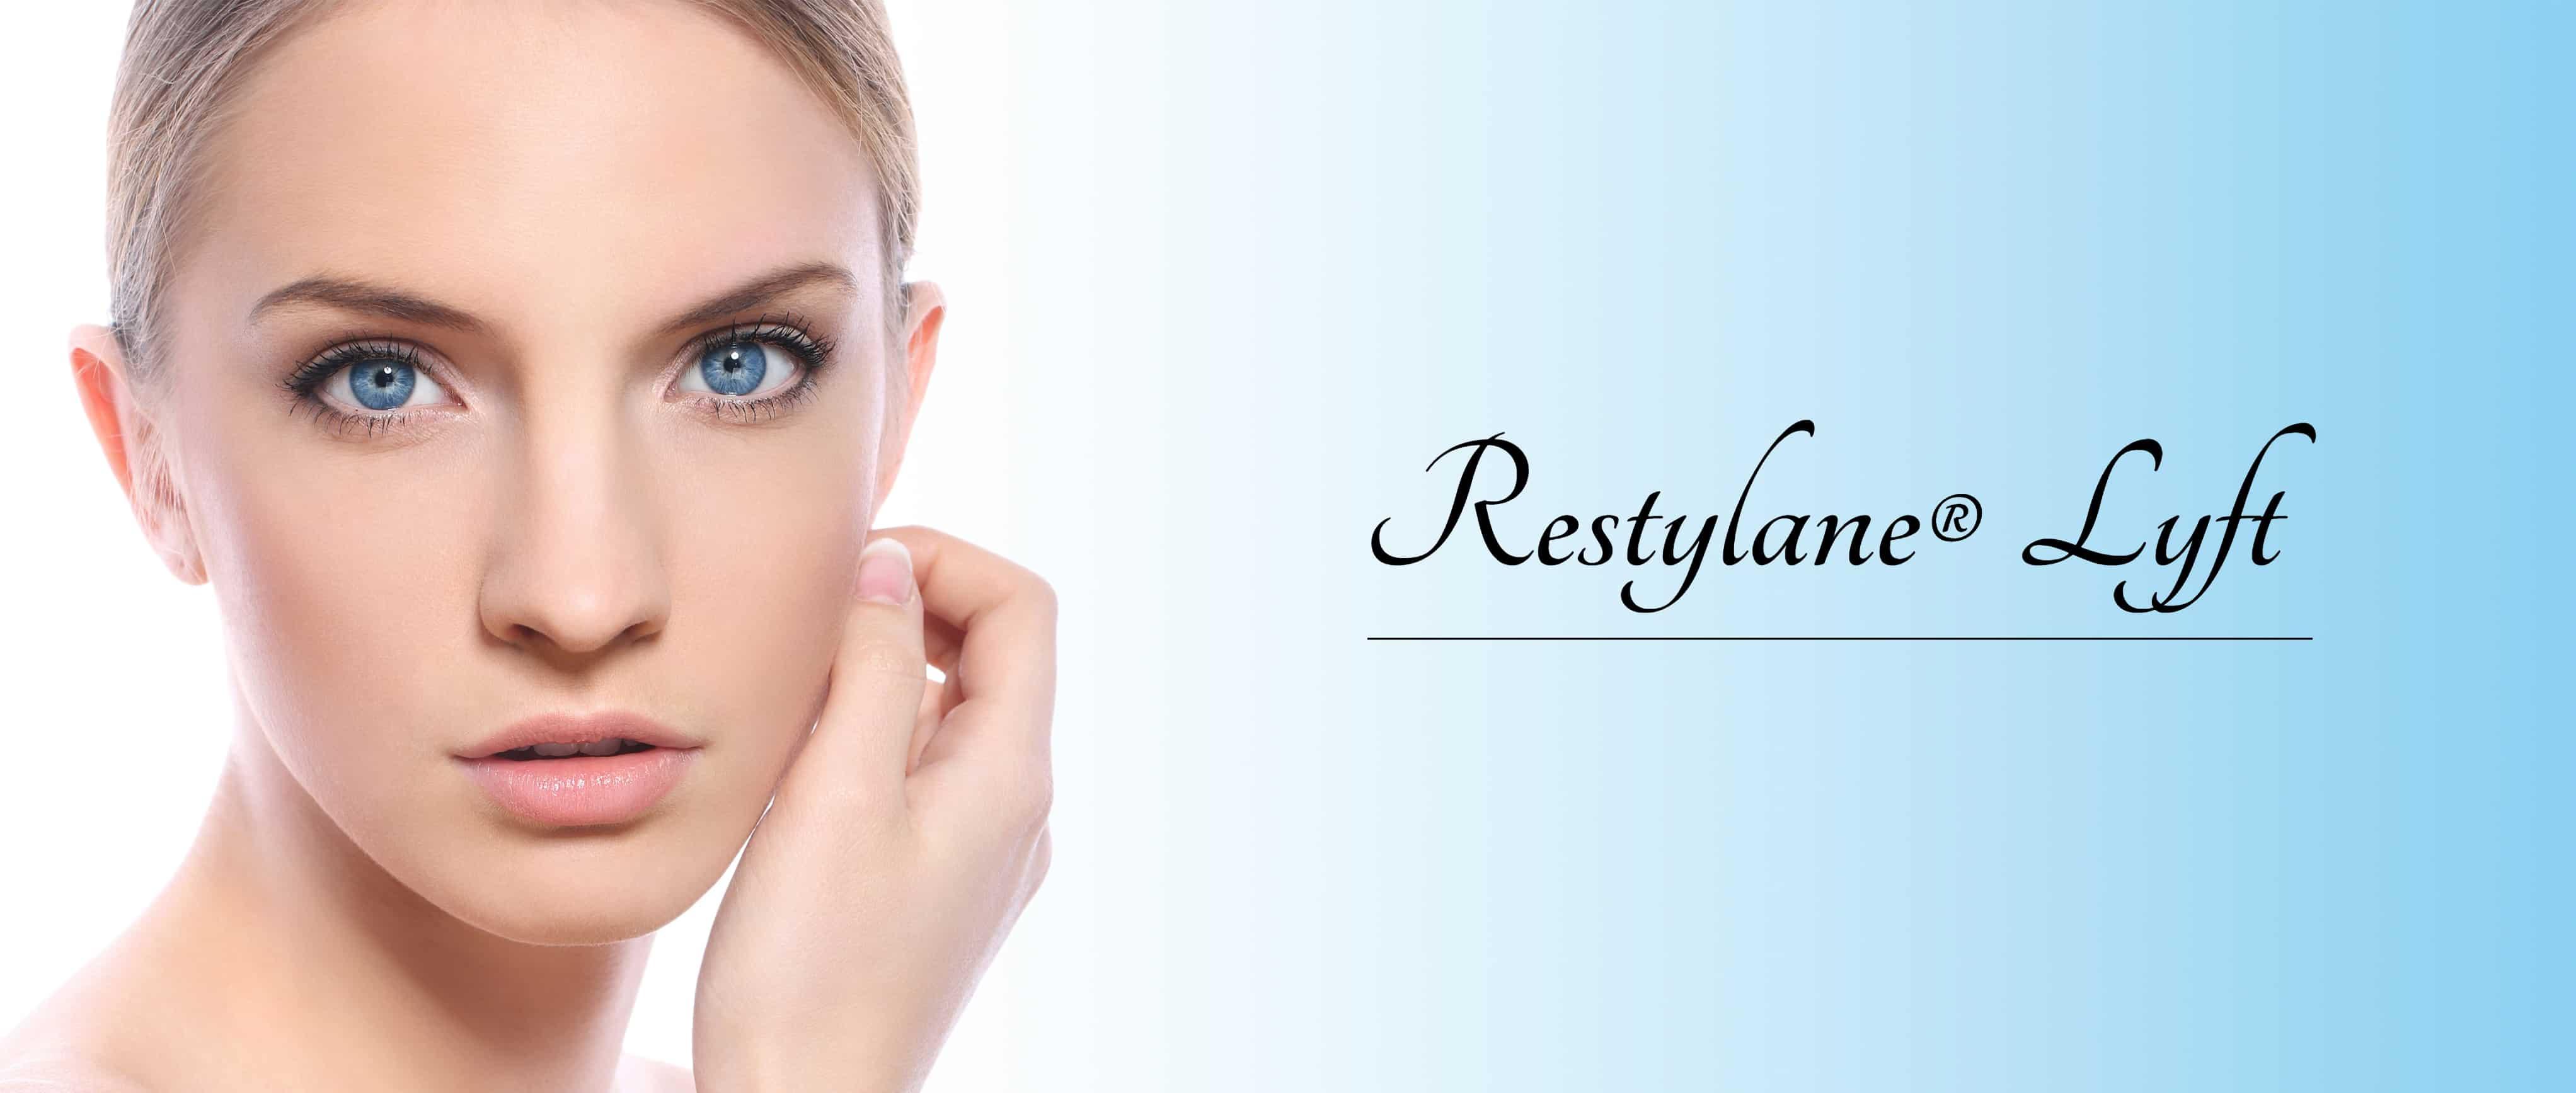 Restylane Lyft